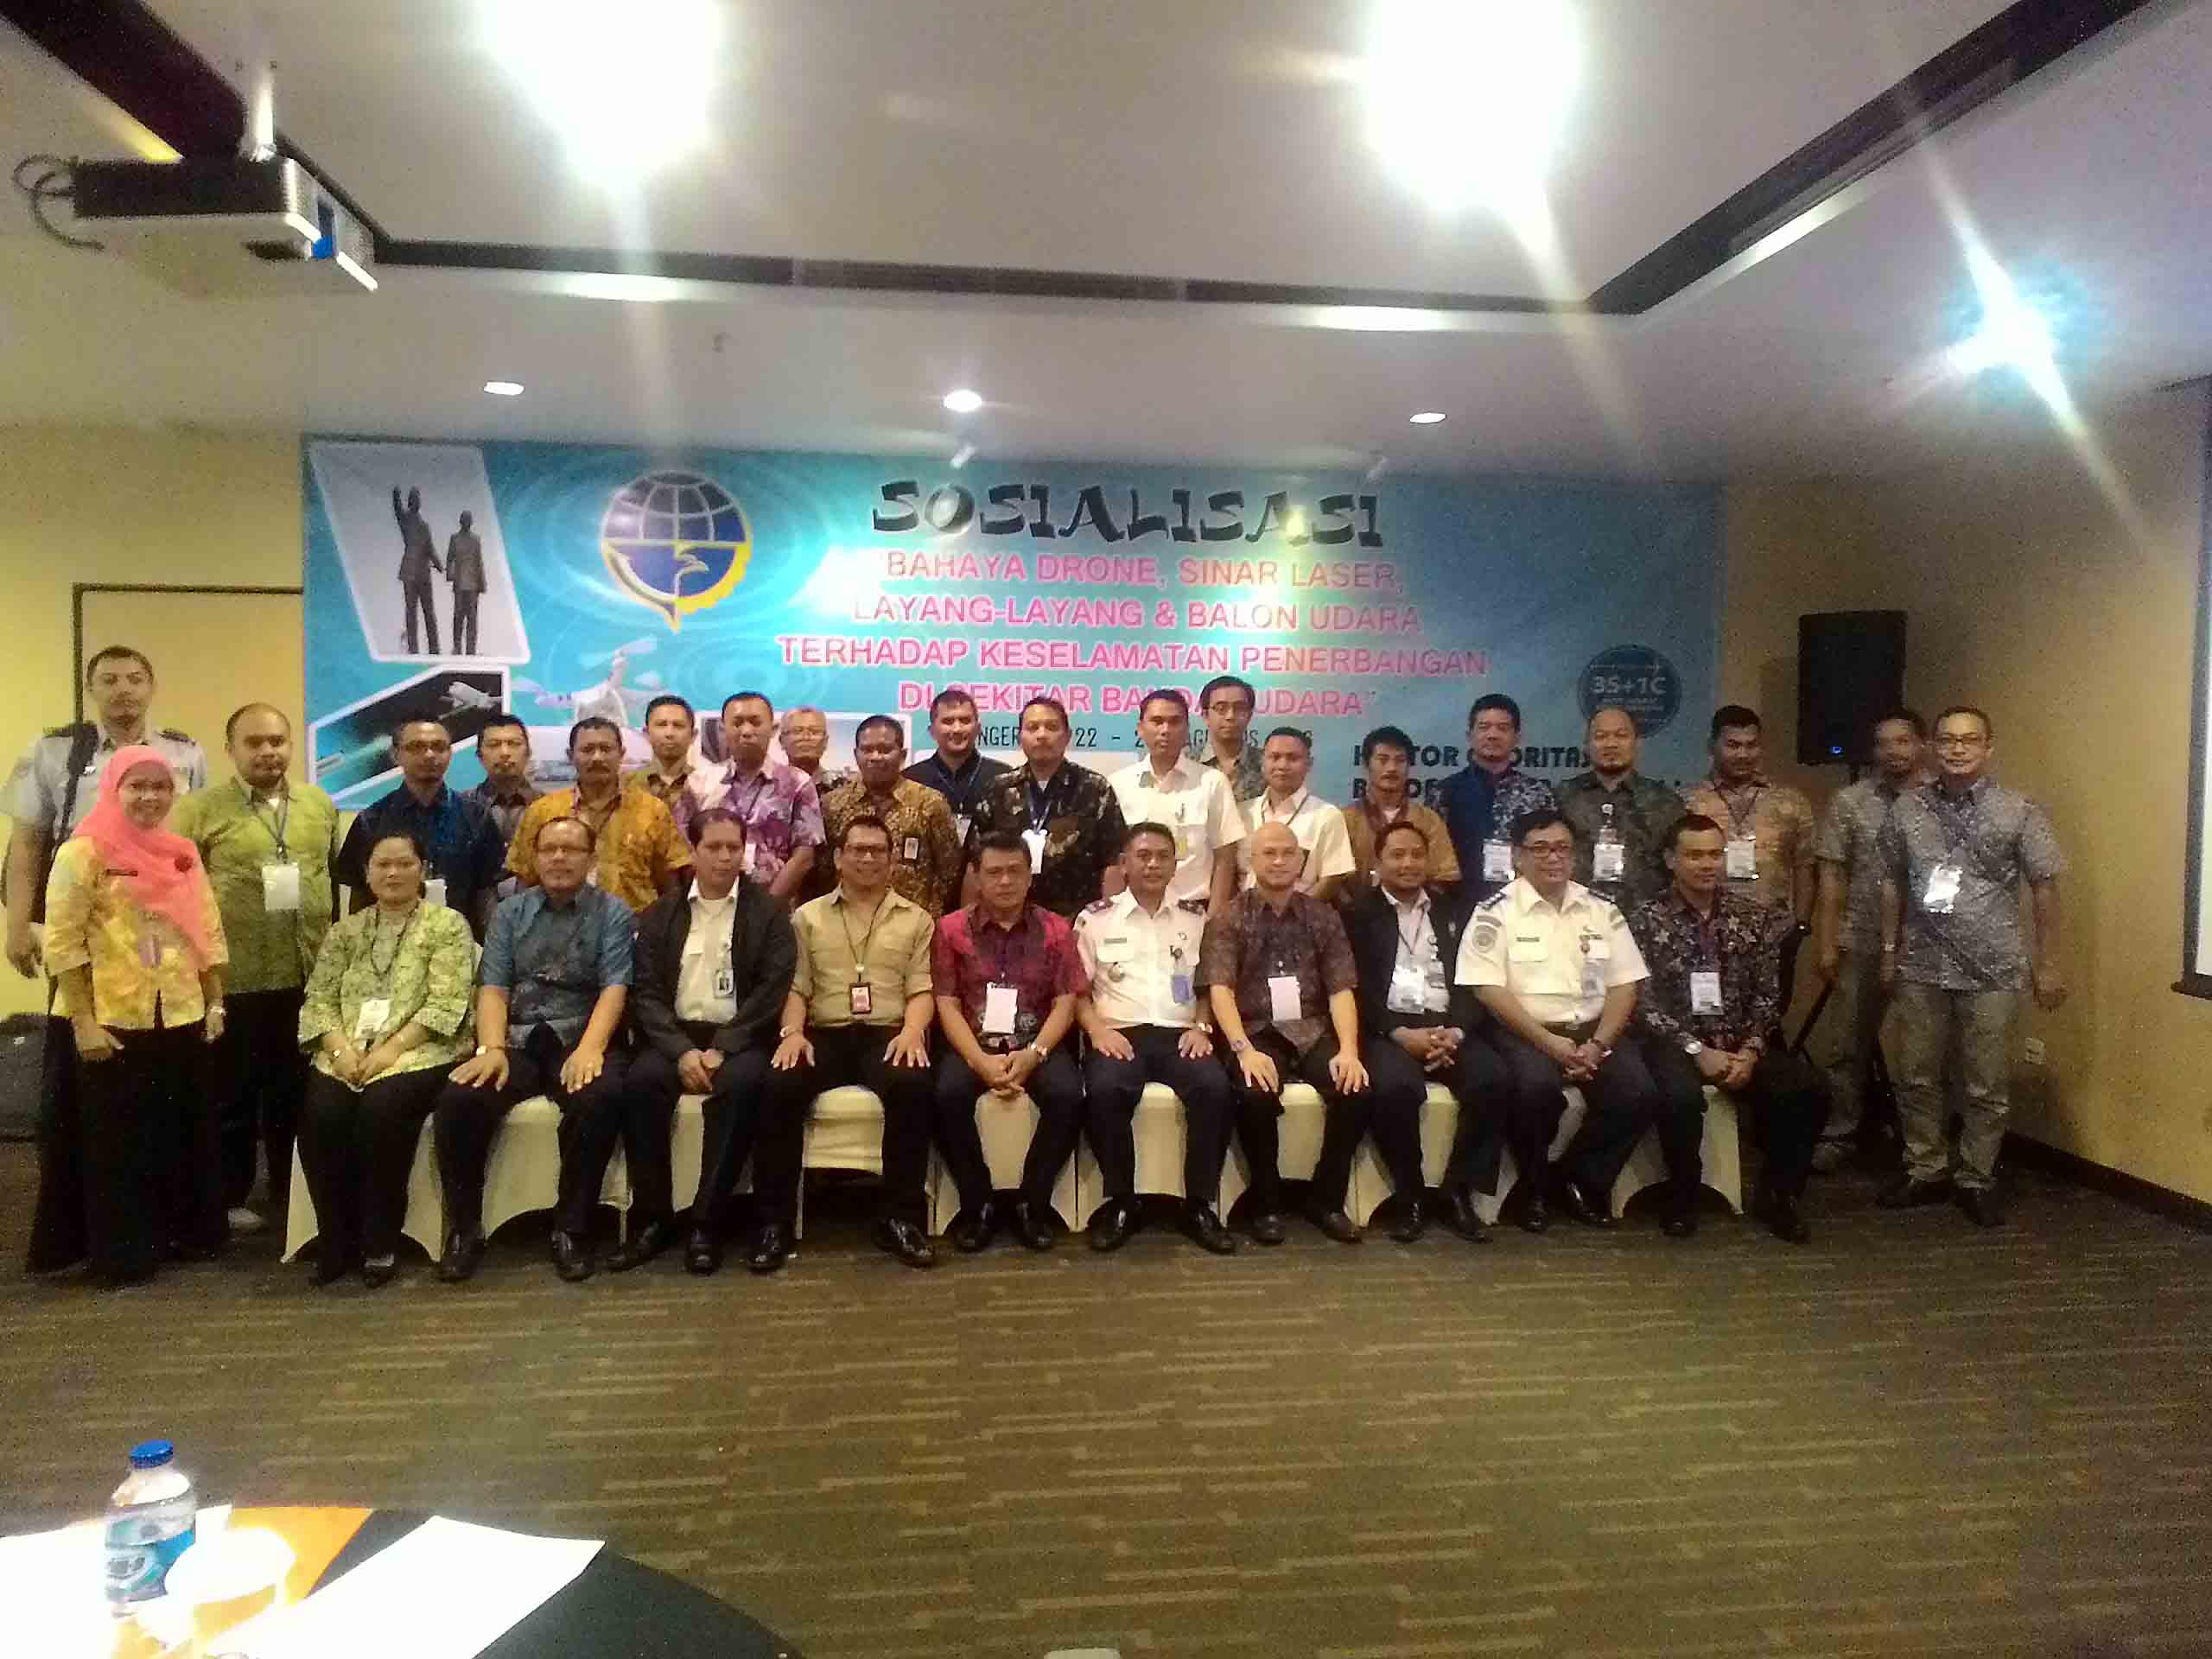 Foto Dok Infopenerbangan.com (eq)